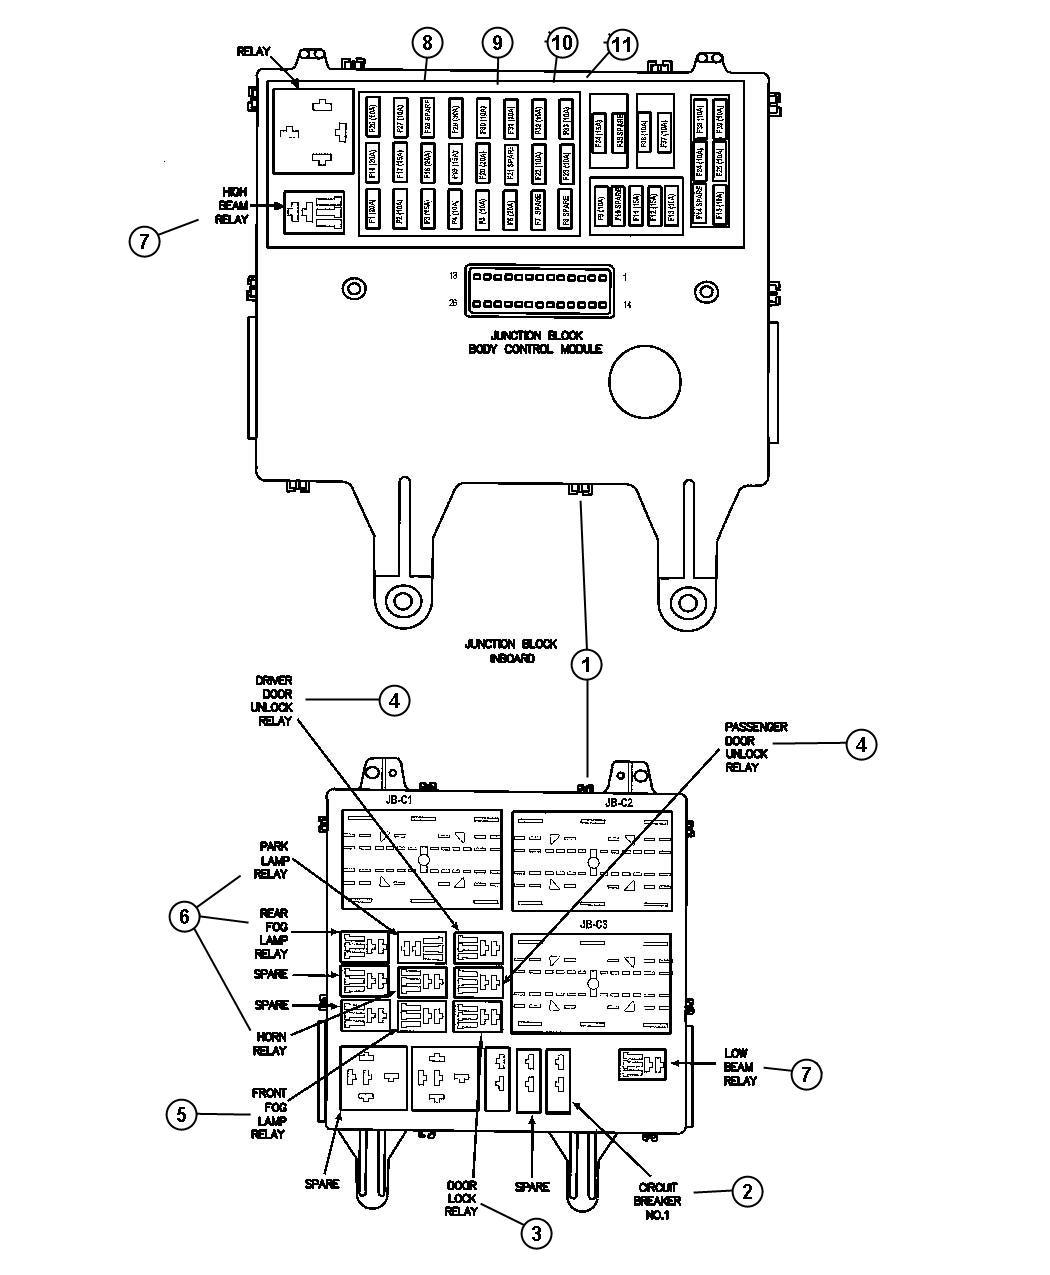 Chrysler Sebring Fuse. Mini. 20 amp, yellow. Eatx, engine